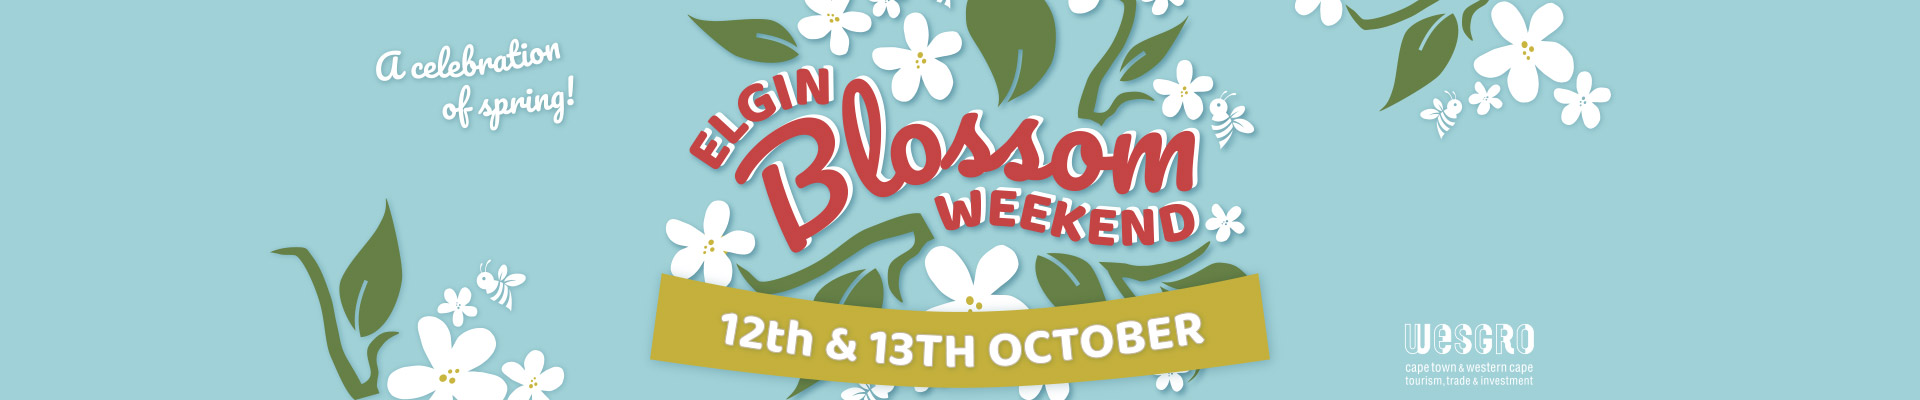 Blossom Weekend 12-13 October 2019